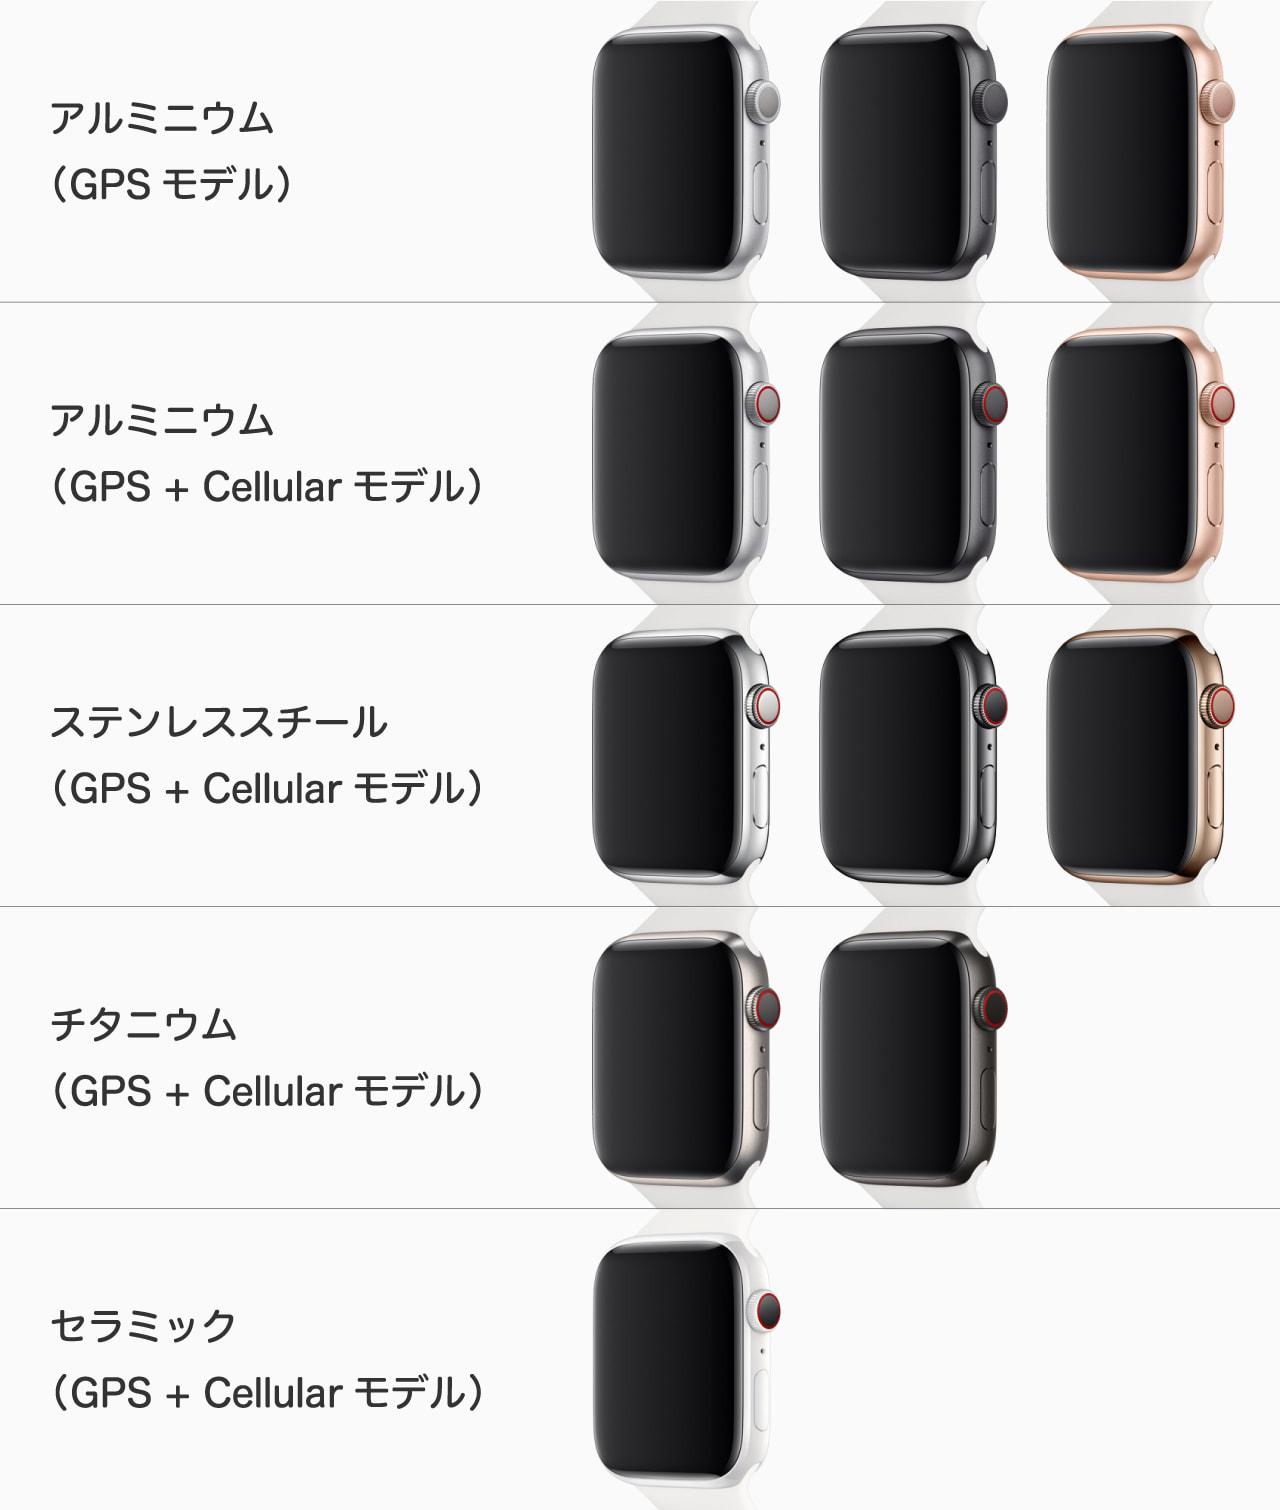 「Apple Watch Series 5」のケース素材一覧